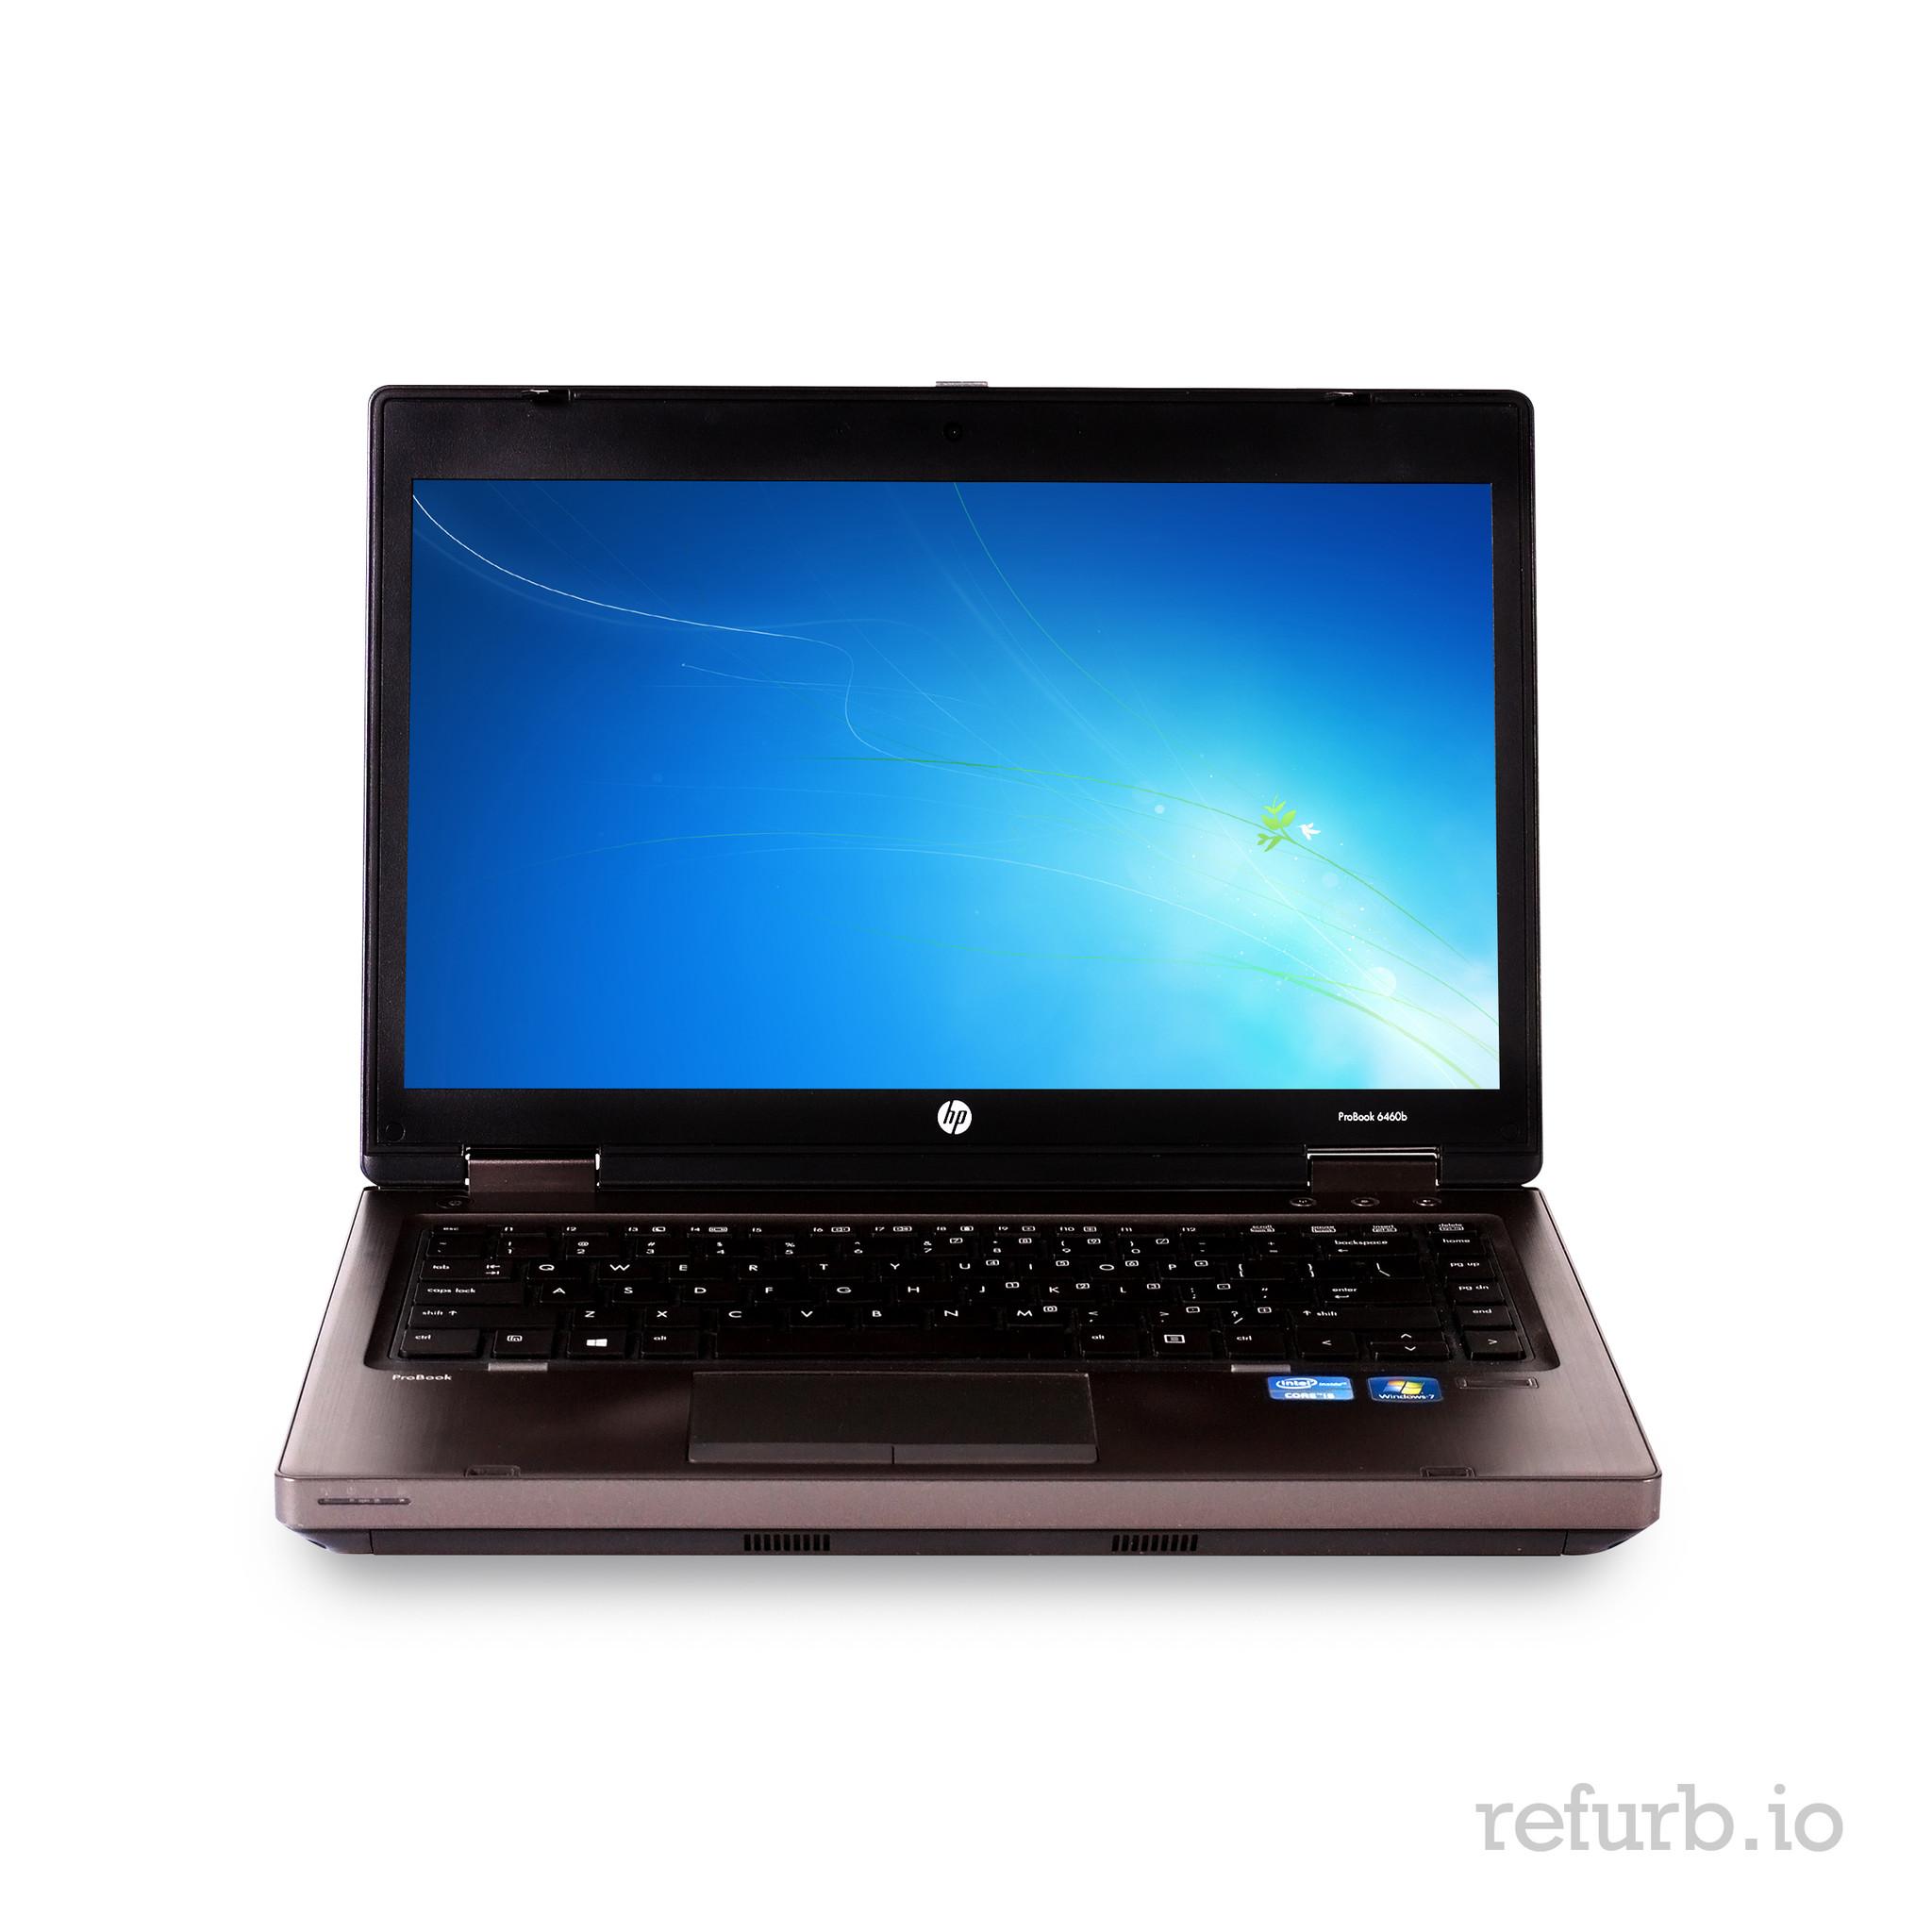 HP PROBOOK 6460b LAPTOP, 4GB, 250GB HDD, INTEL i5 2520M 2.5GHz | CNB